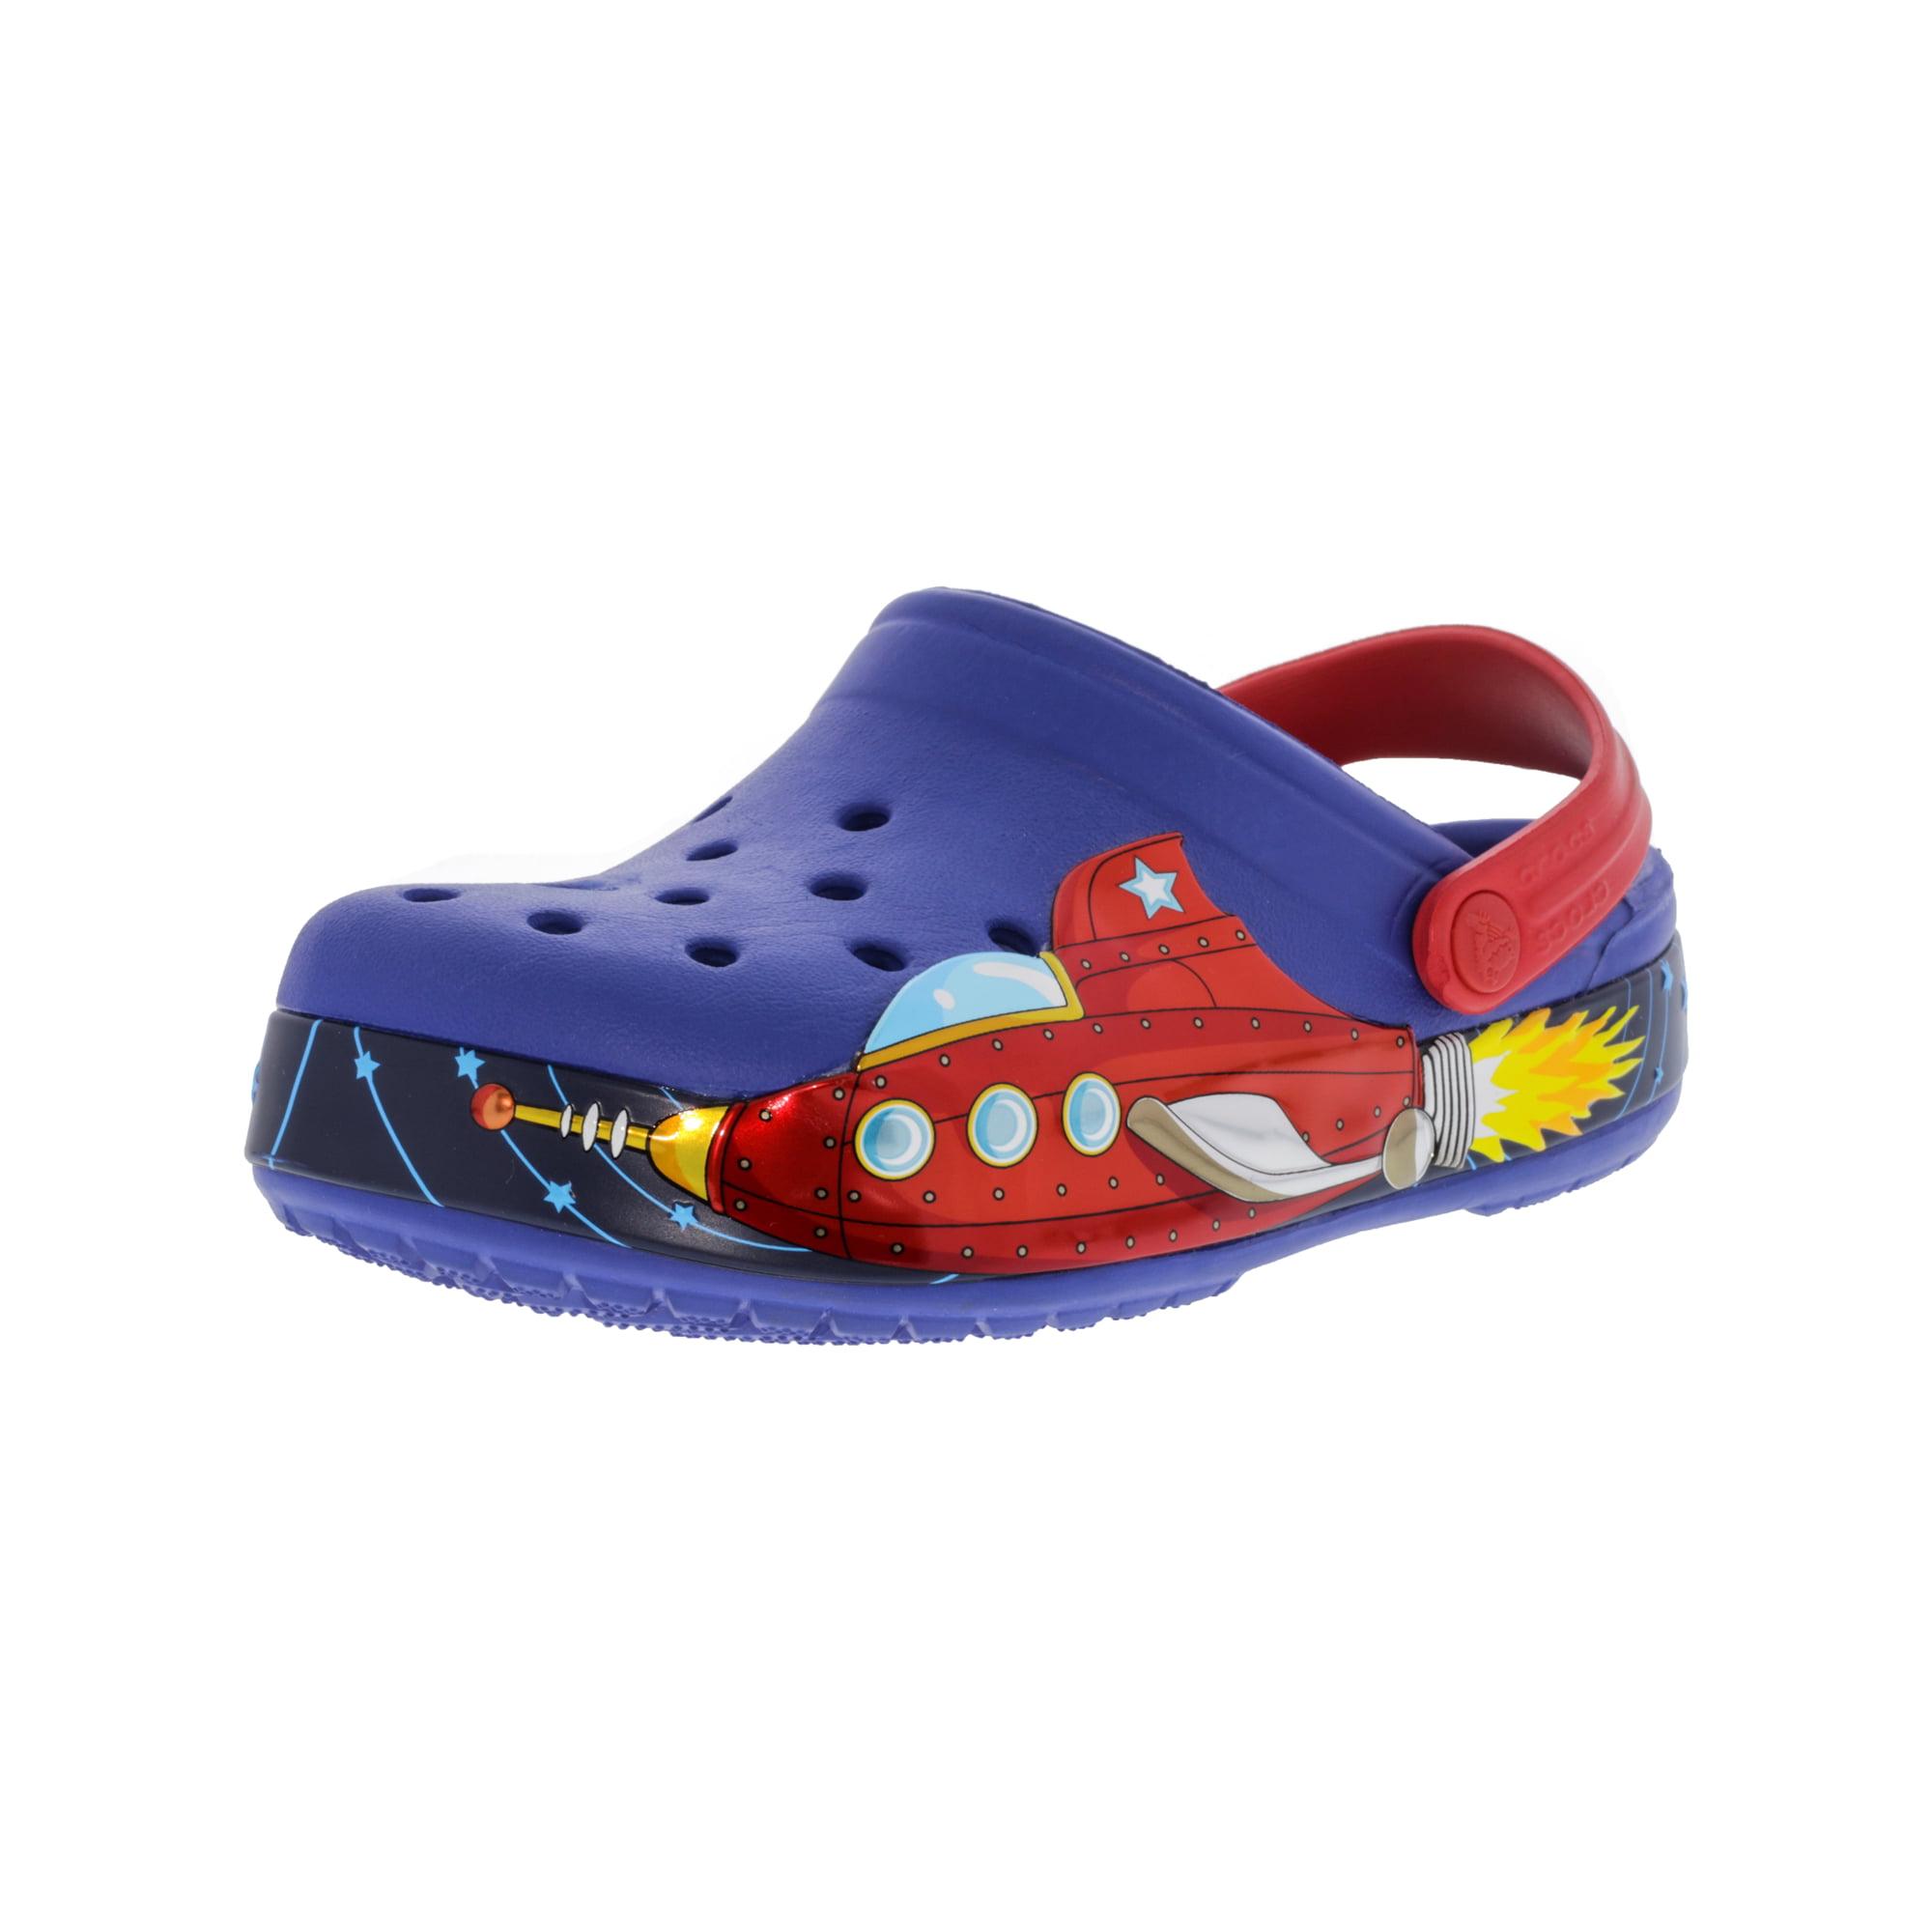 2146c6281 Buy Crocs Crocband Galactic Clog Cerulean Blue Clogs - 12M ...